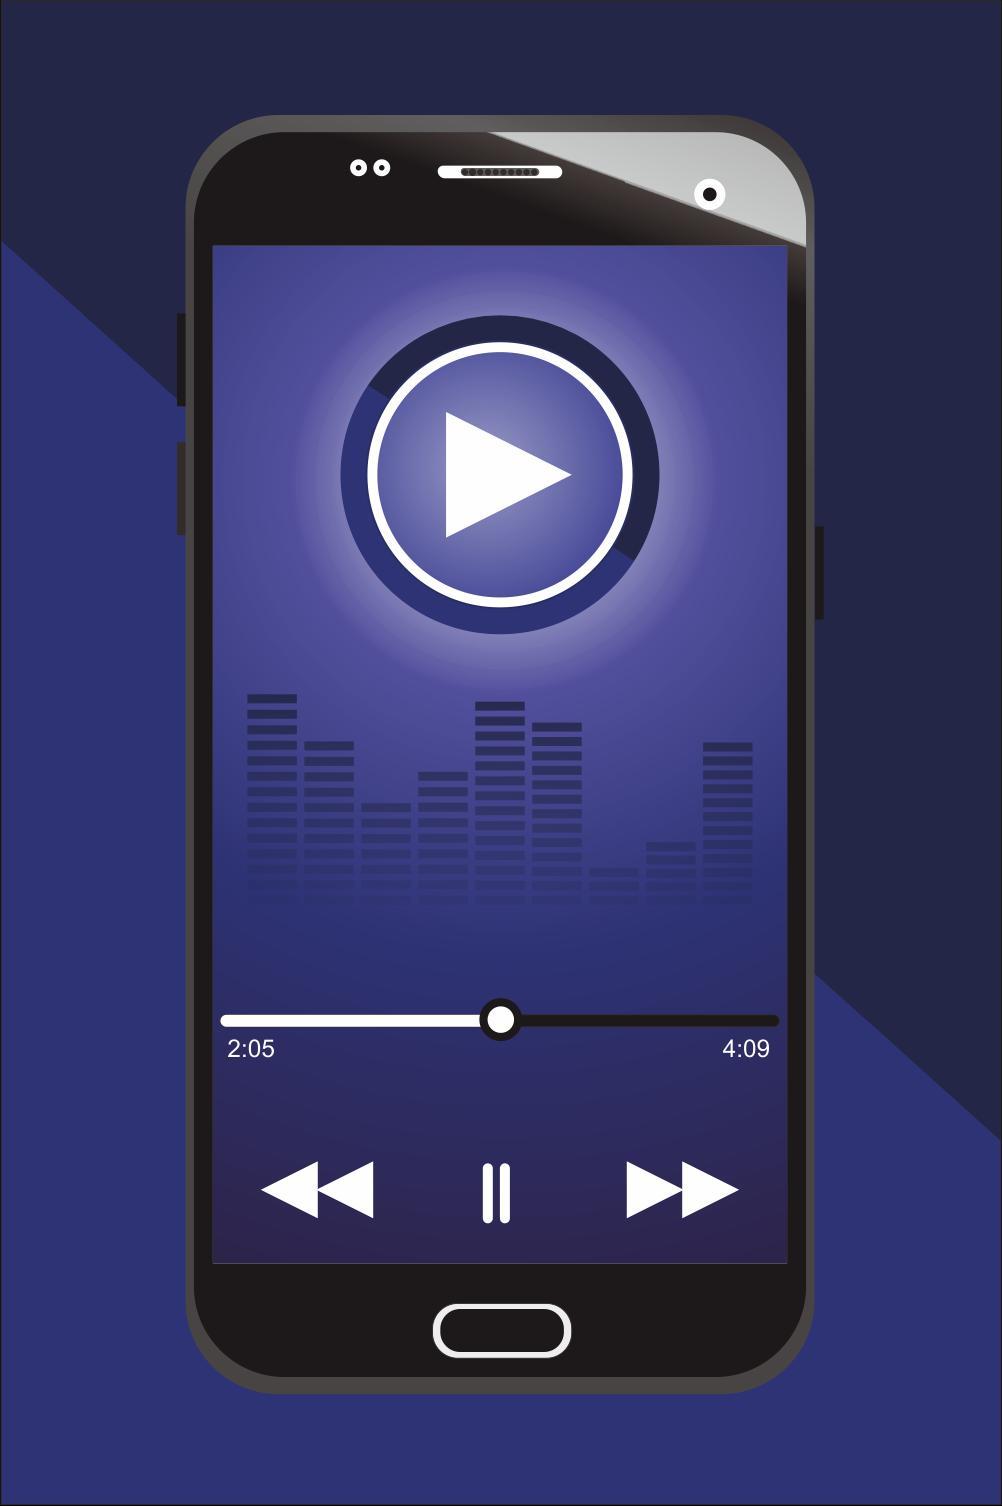 Lottie Dottie Chicken Musica MP3 for Android - APK Download